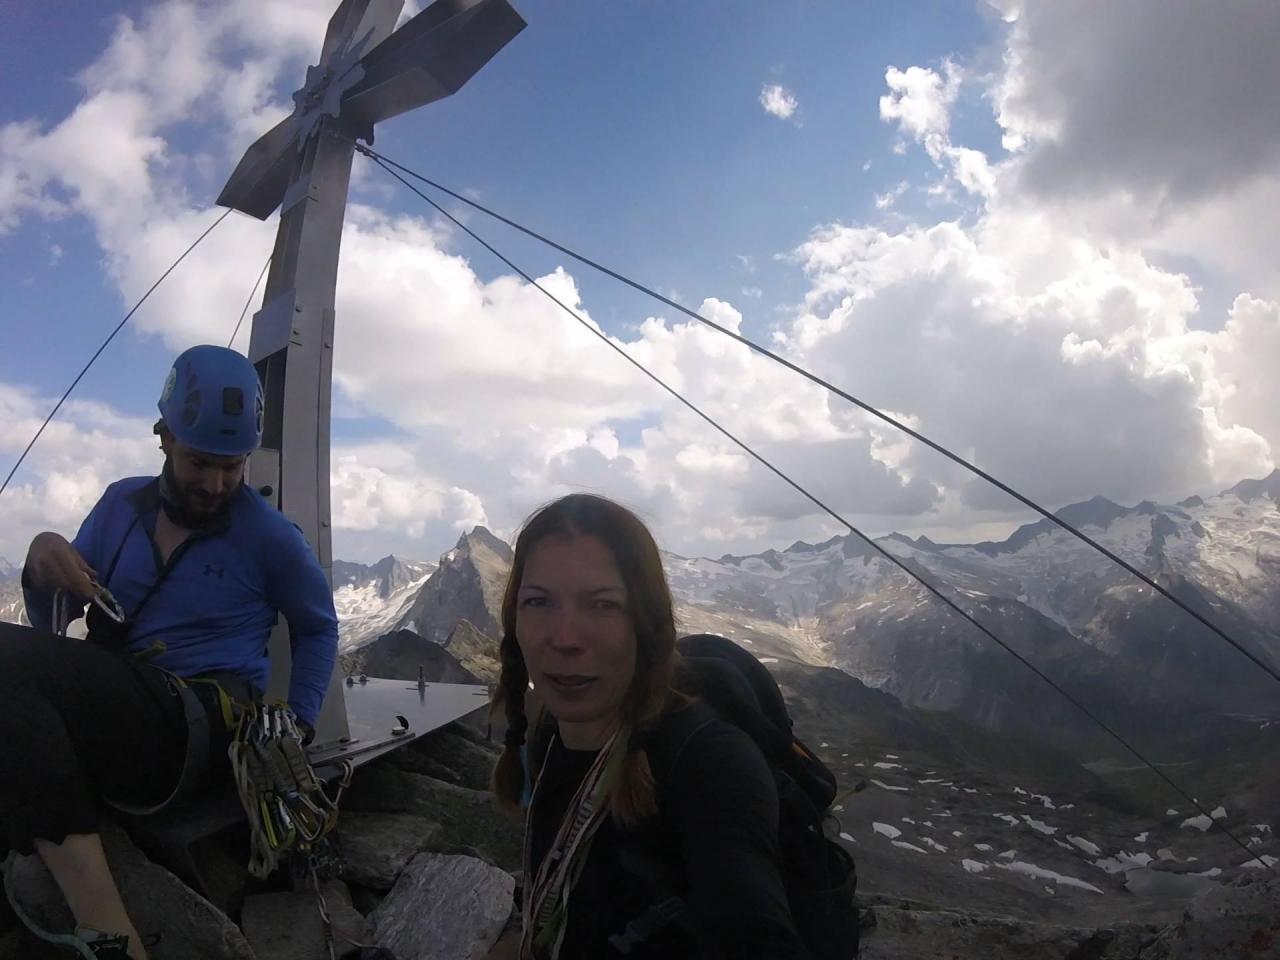 A picture from zsigmondyspitze, zillertal by Csilla Mezei